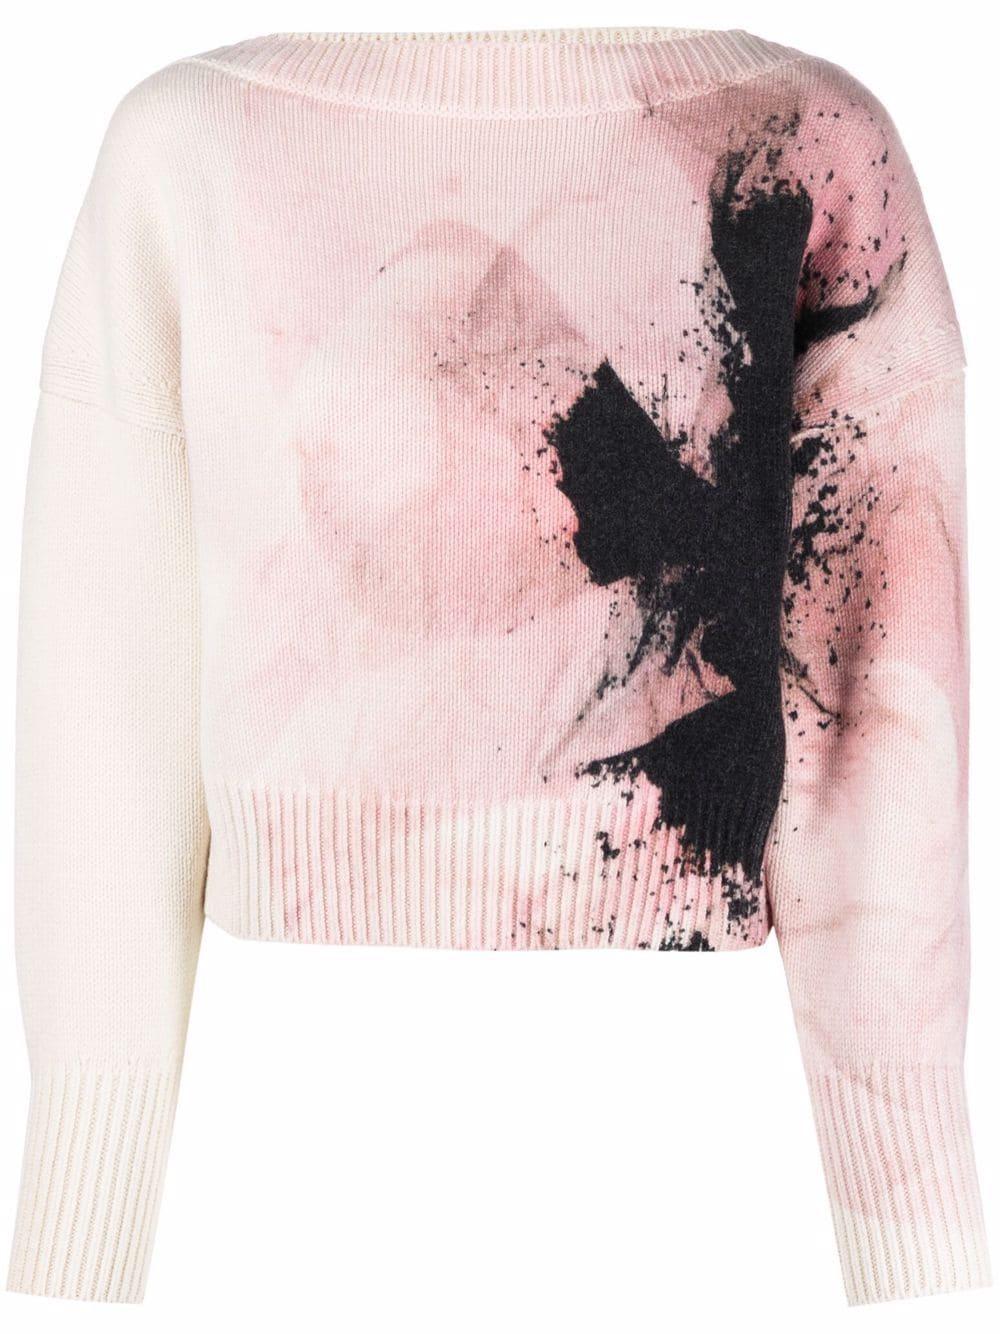 Printed Boatneck Sweater Item # 679403Q1AW2